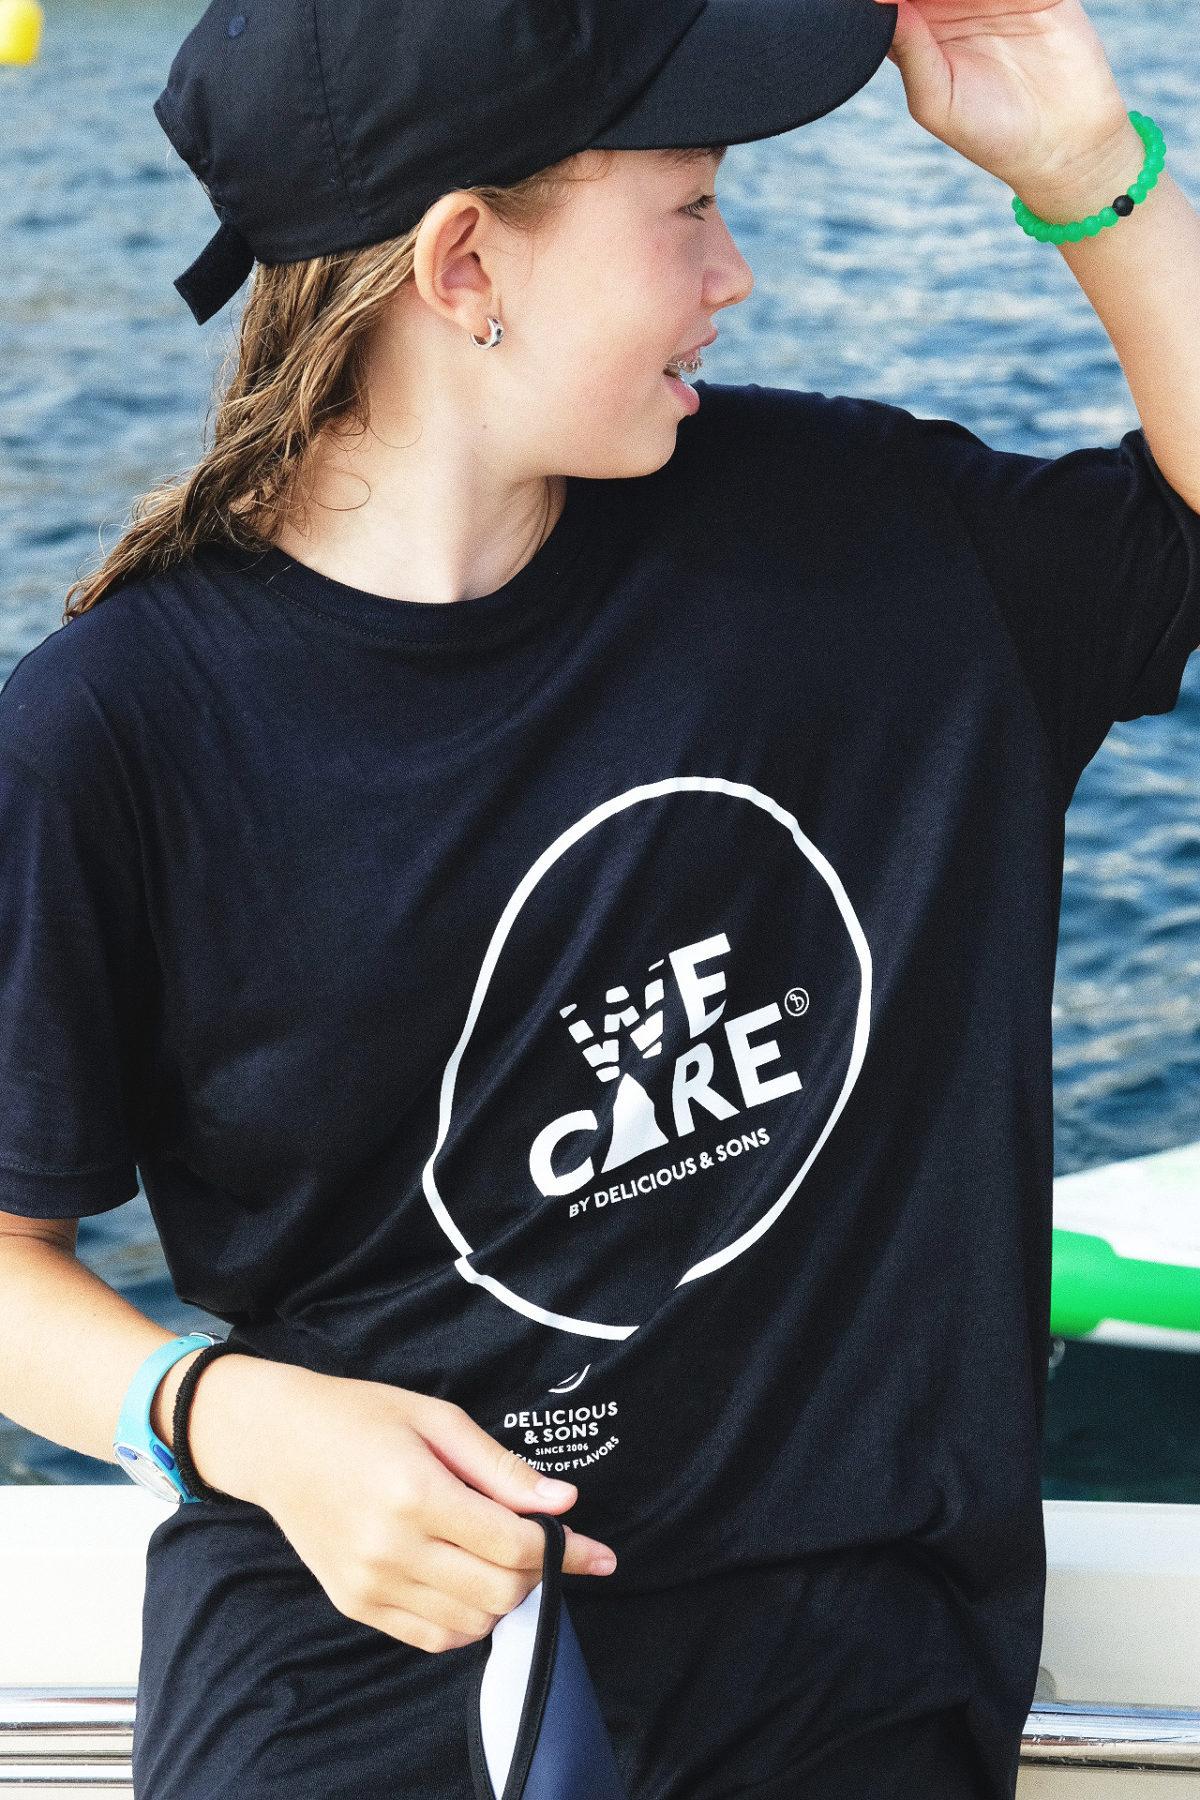 Mediterranean Cleanups — Delicious & Sons